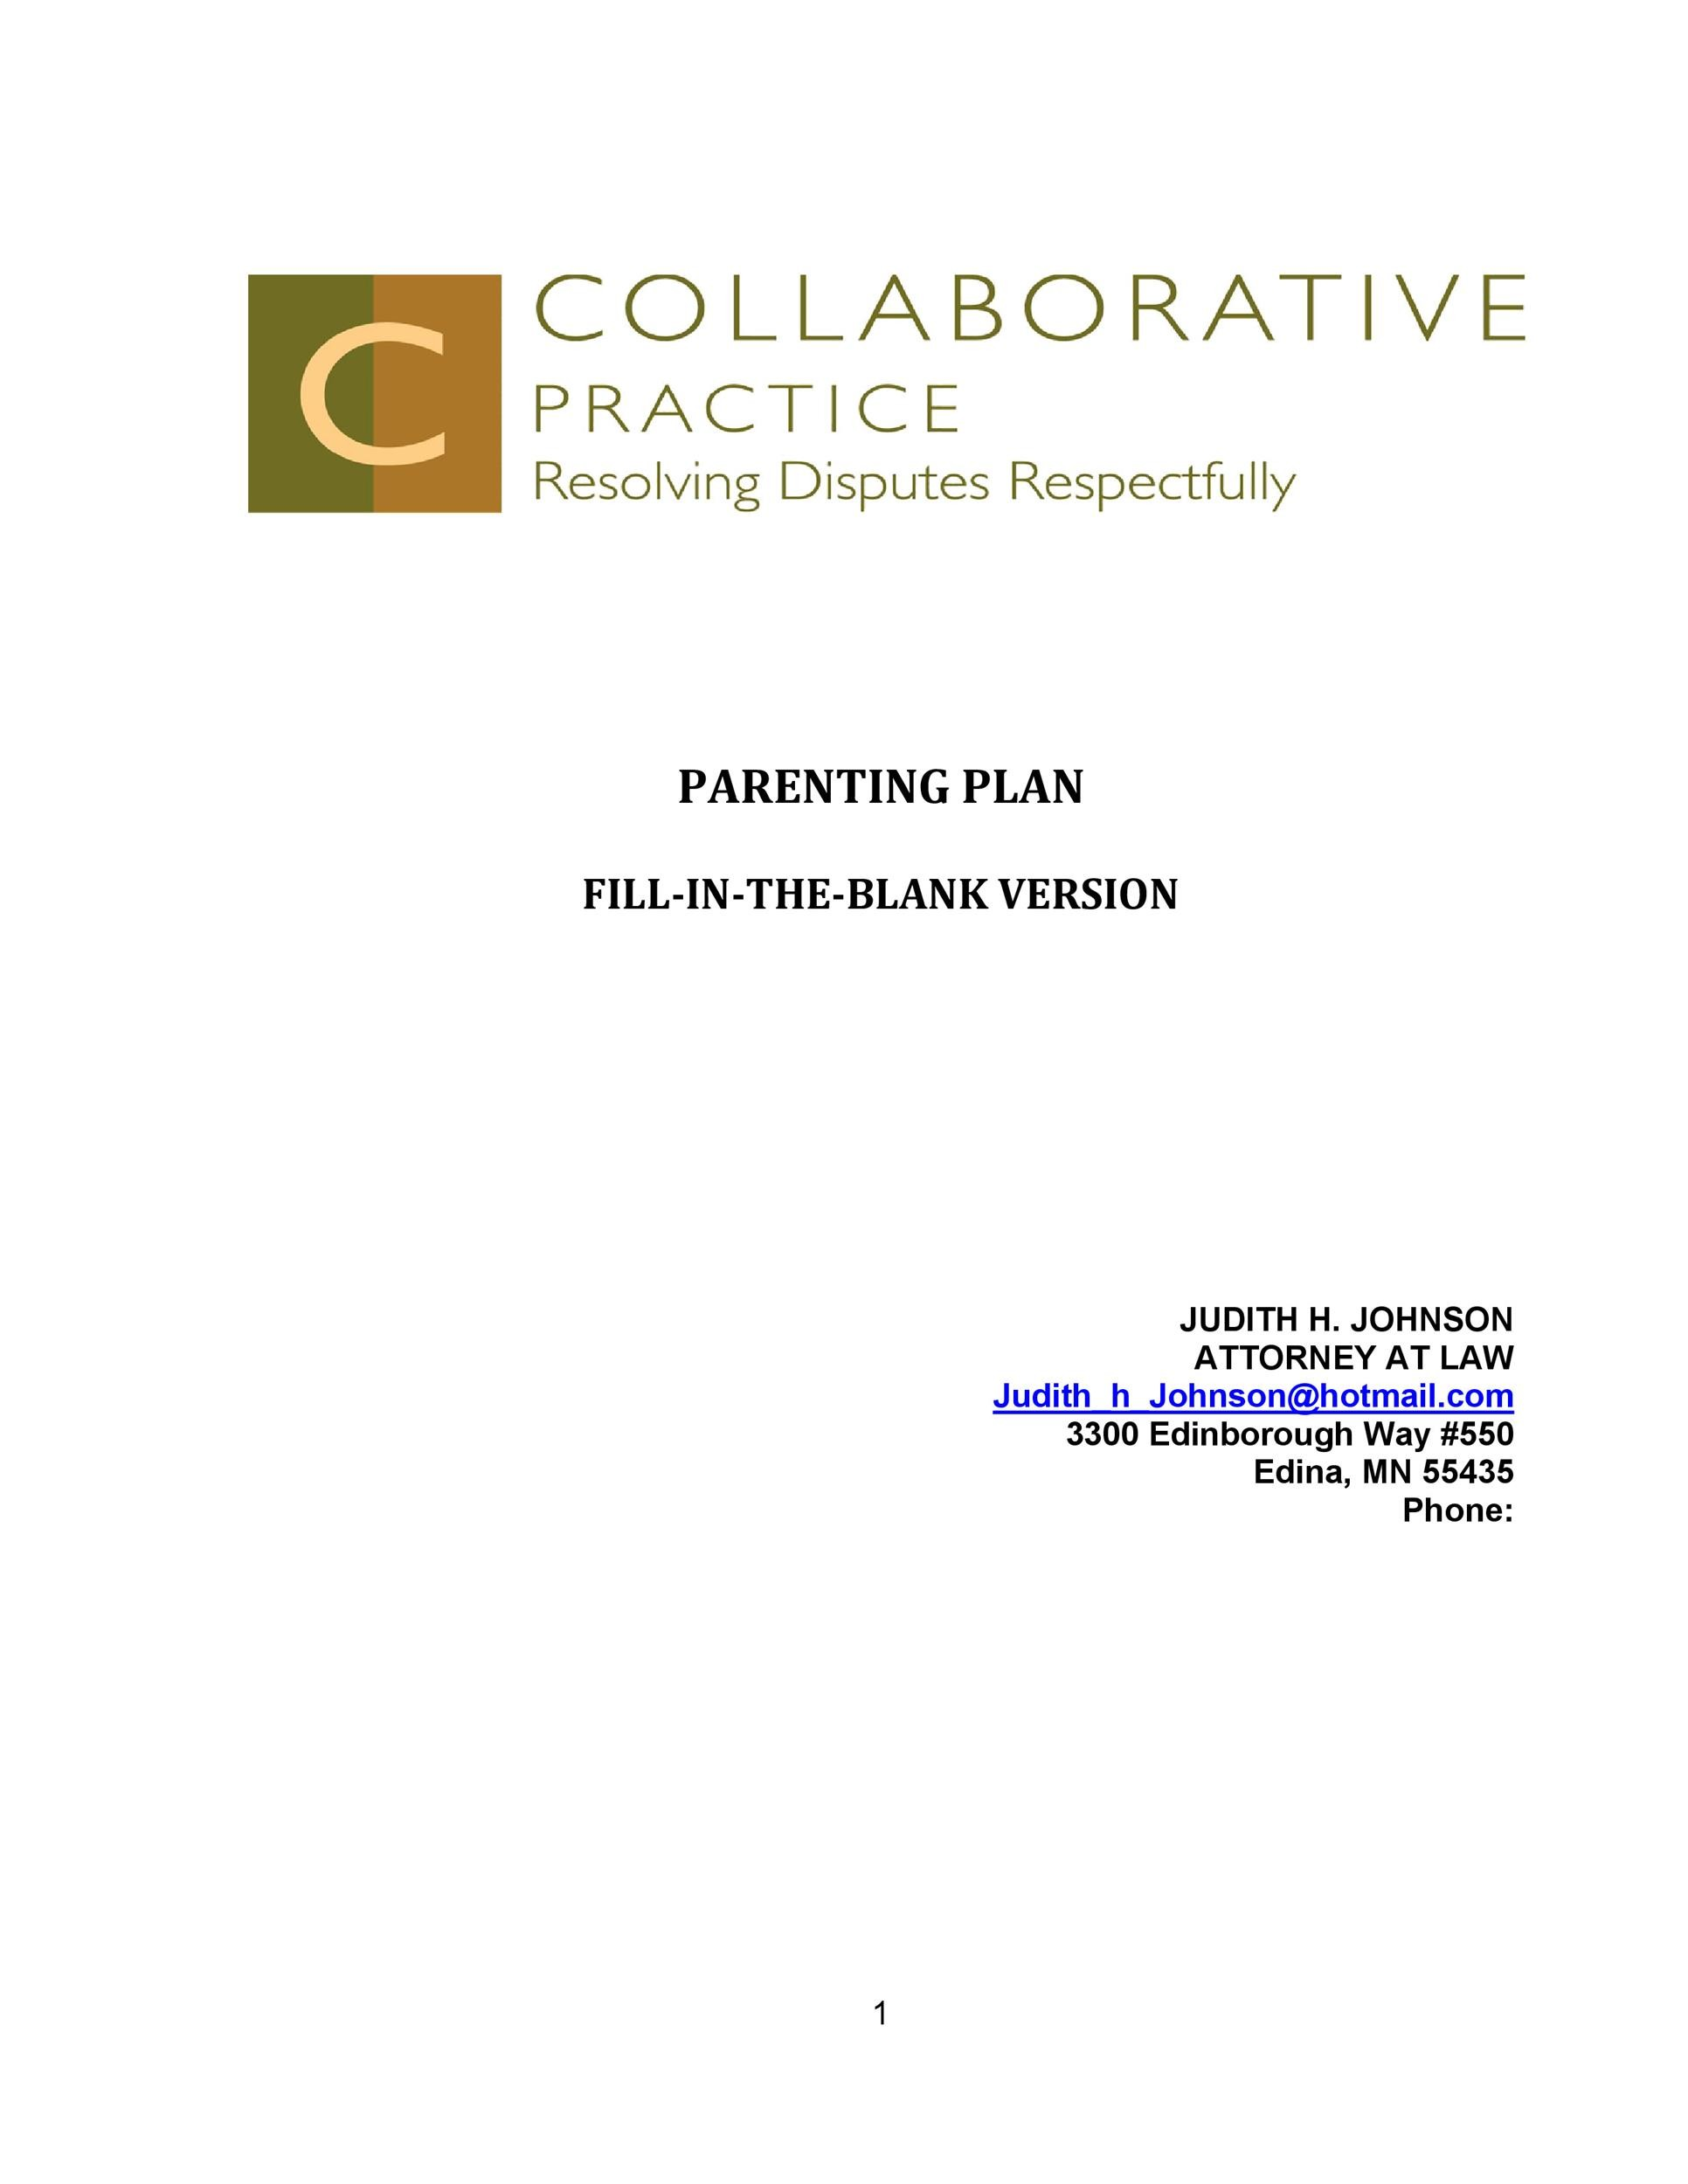 Free parenting plan template 45